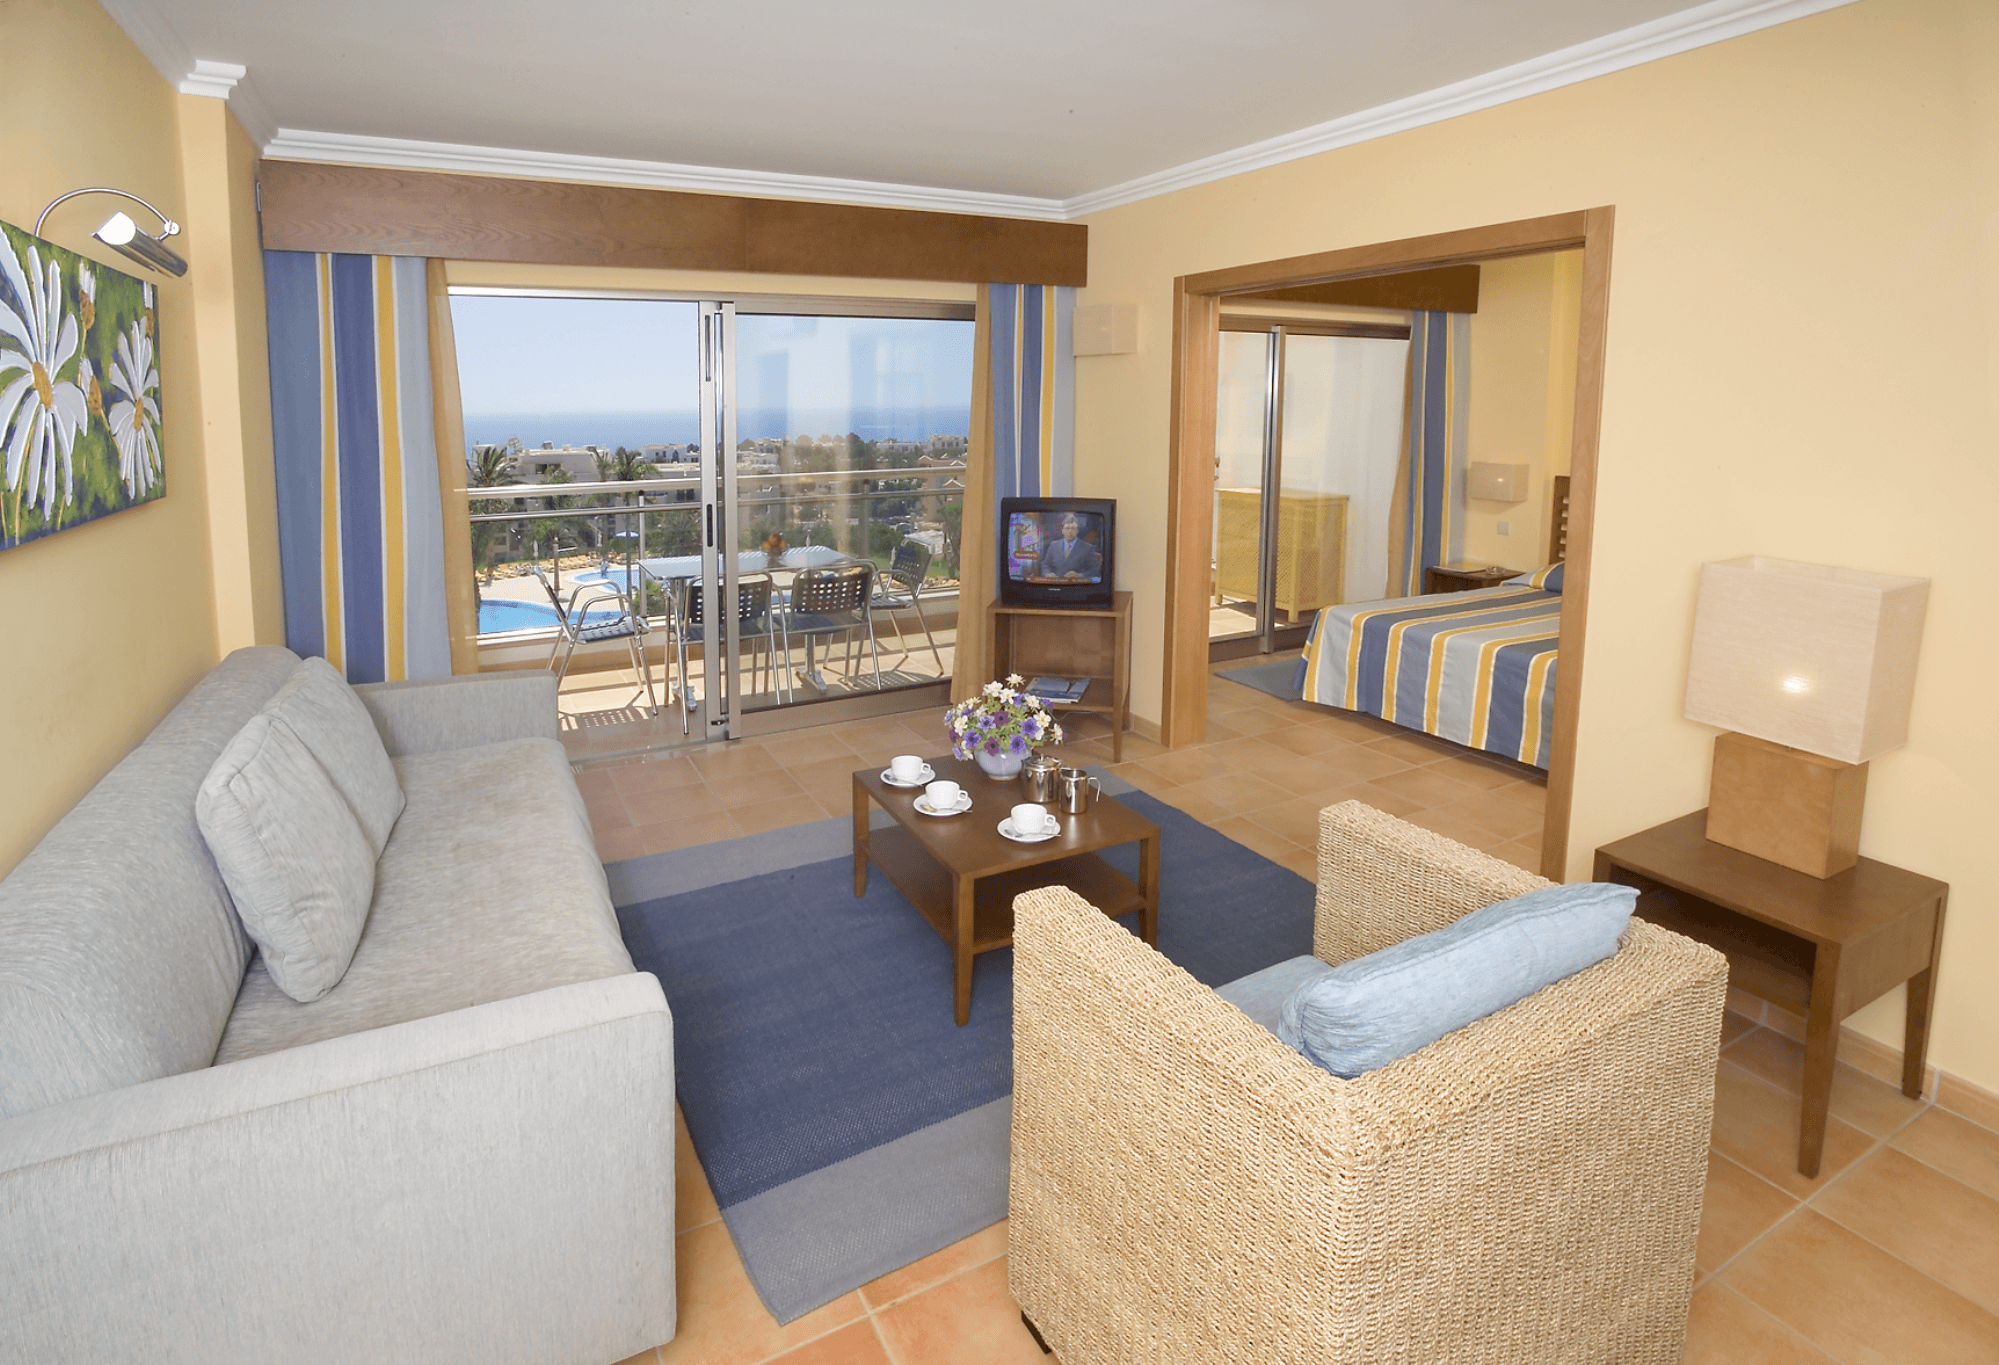 Aparthotel Alto da Colina - kamer/appartement